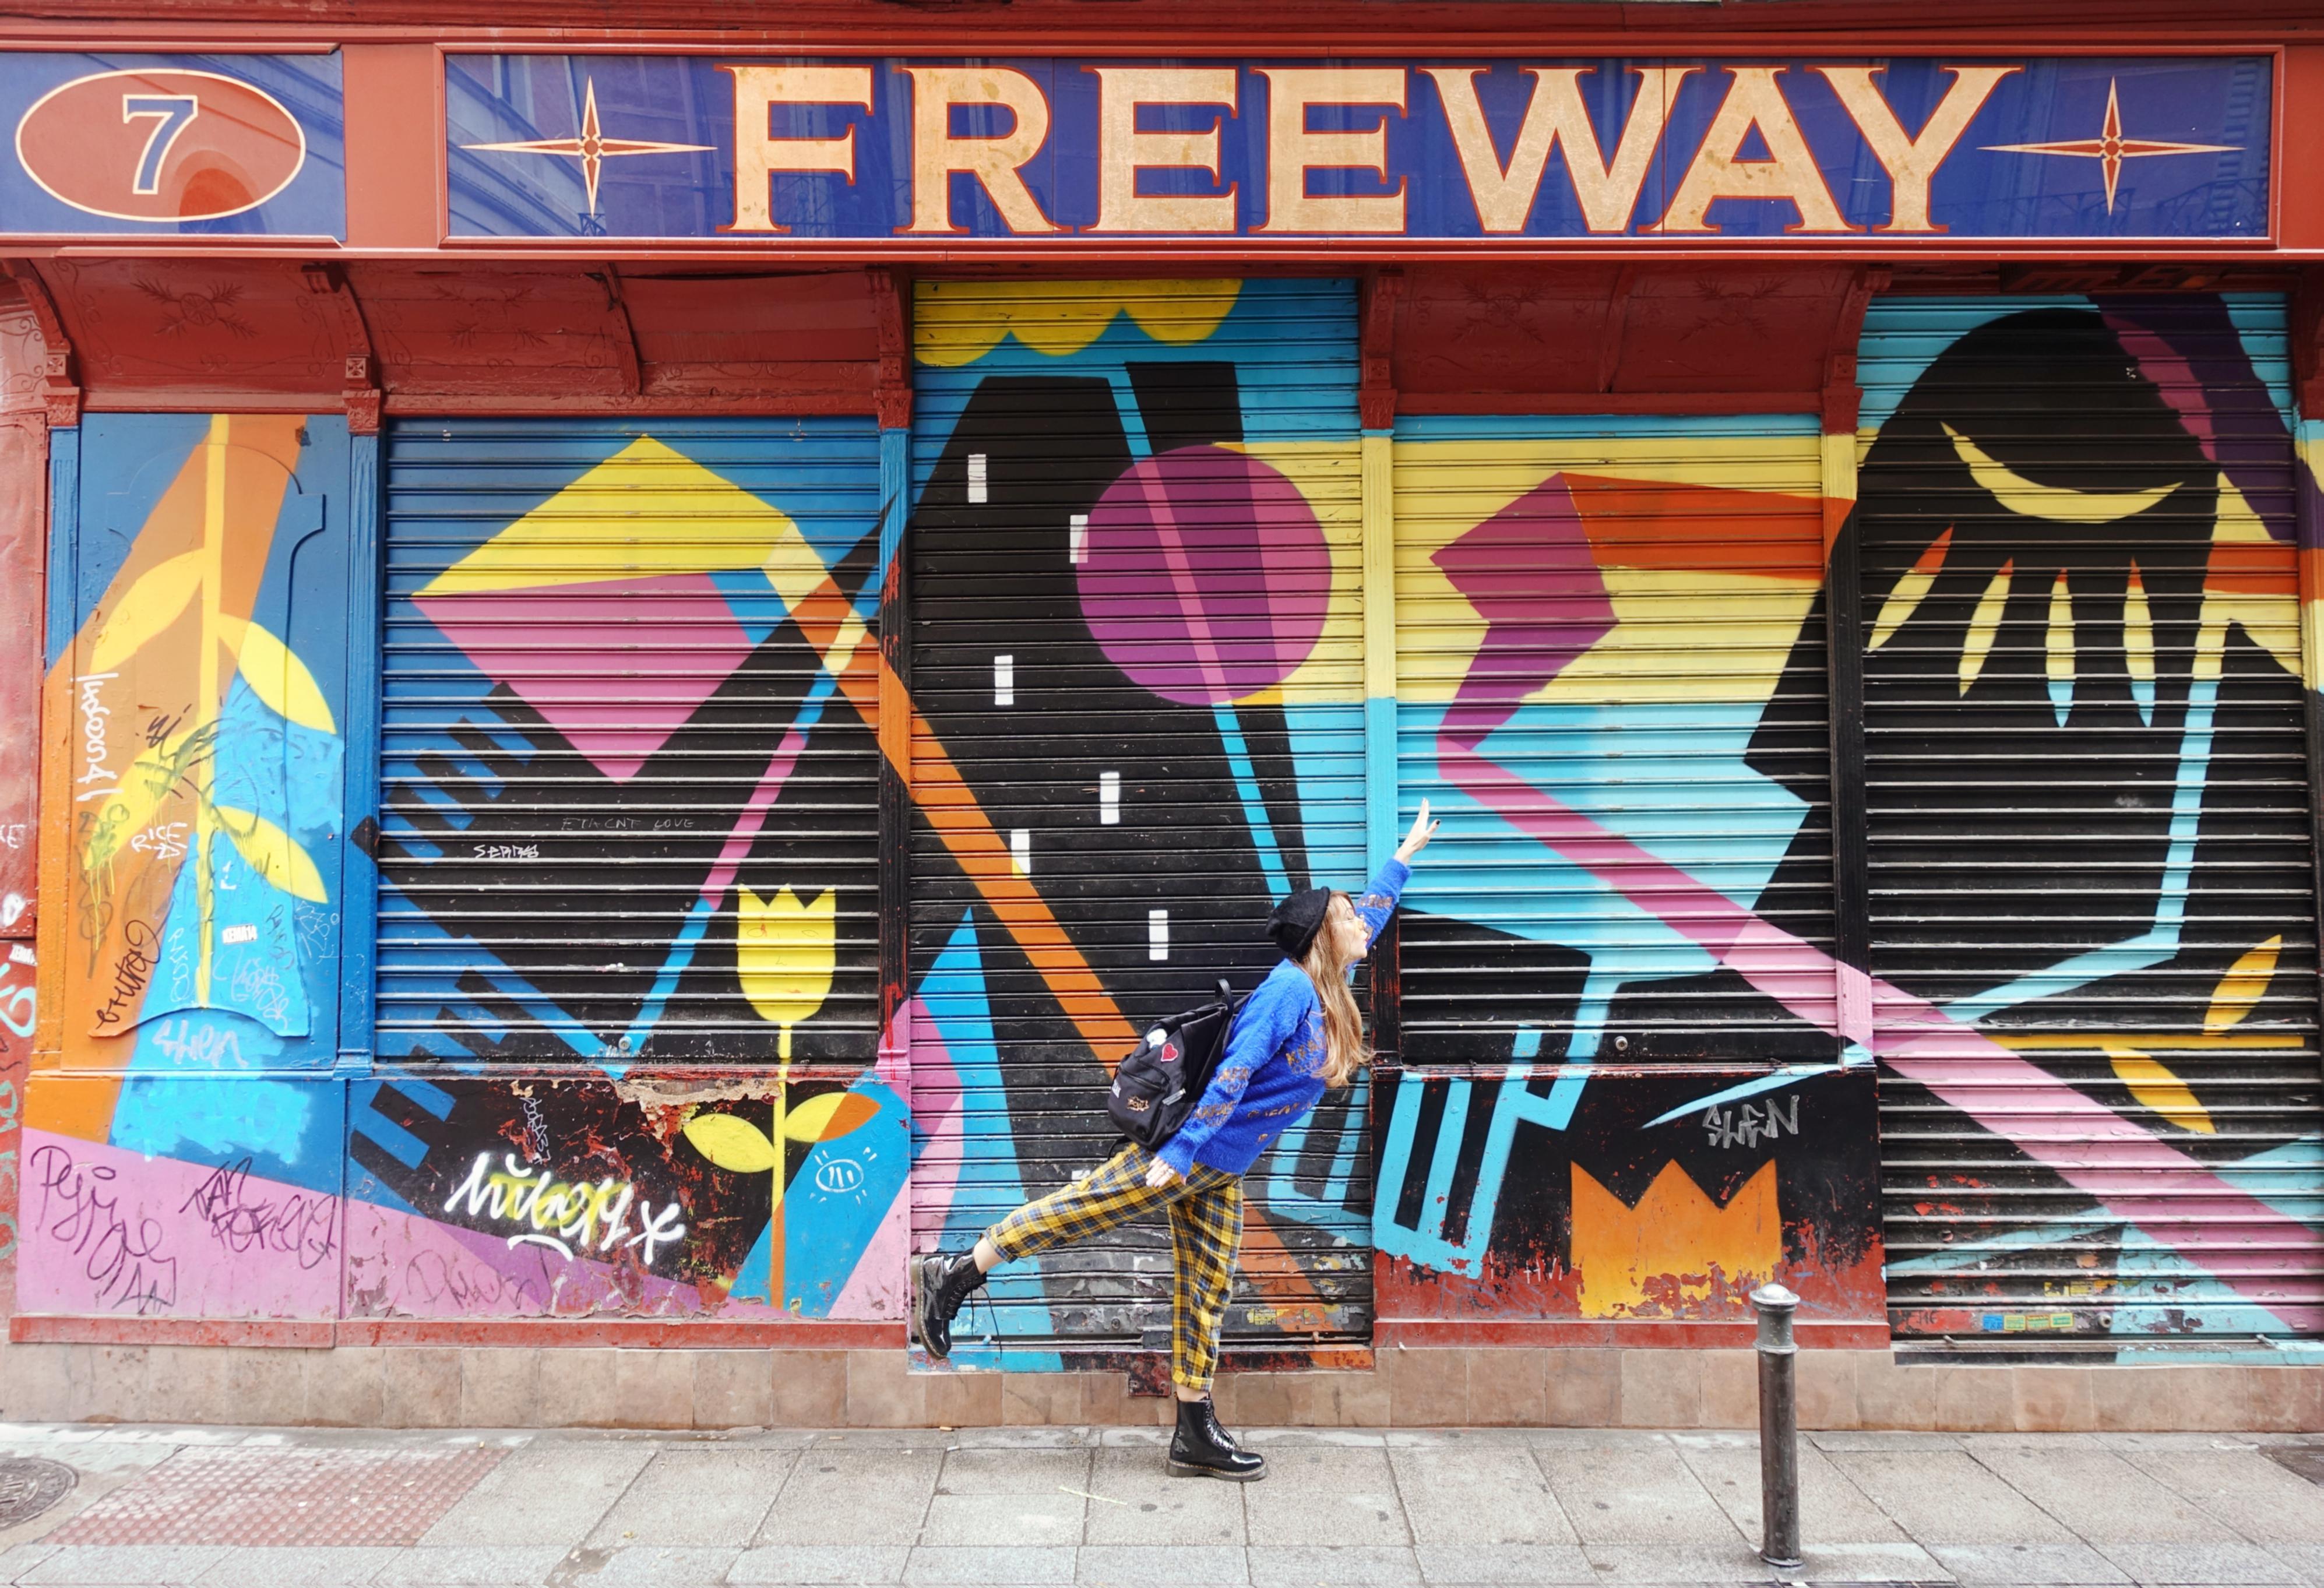 mejores-barrios-de-madrid-malasana-PiensaenChic-blog-de-moda-Chicadicta-influencer-fashionista-mollybracken-clothes-look-de-cuadros-Chic-adicta-Piensa-en-Chic